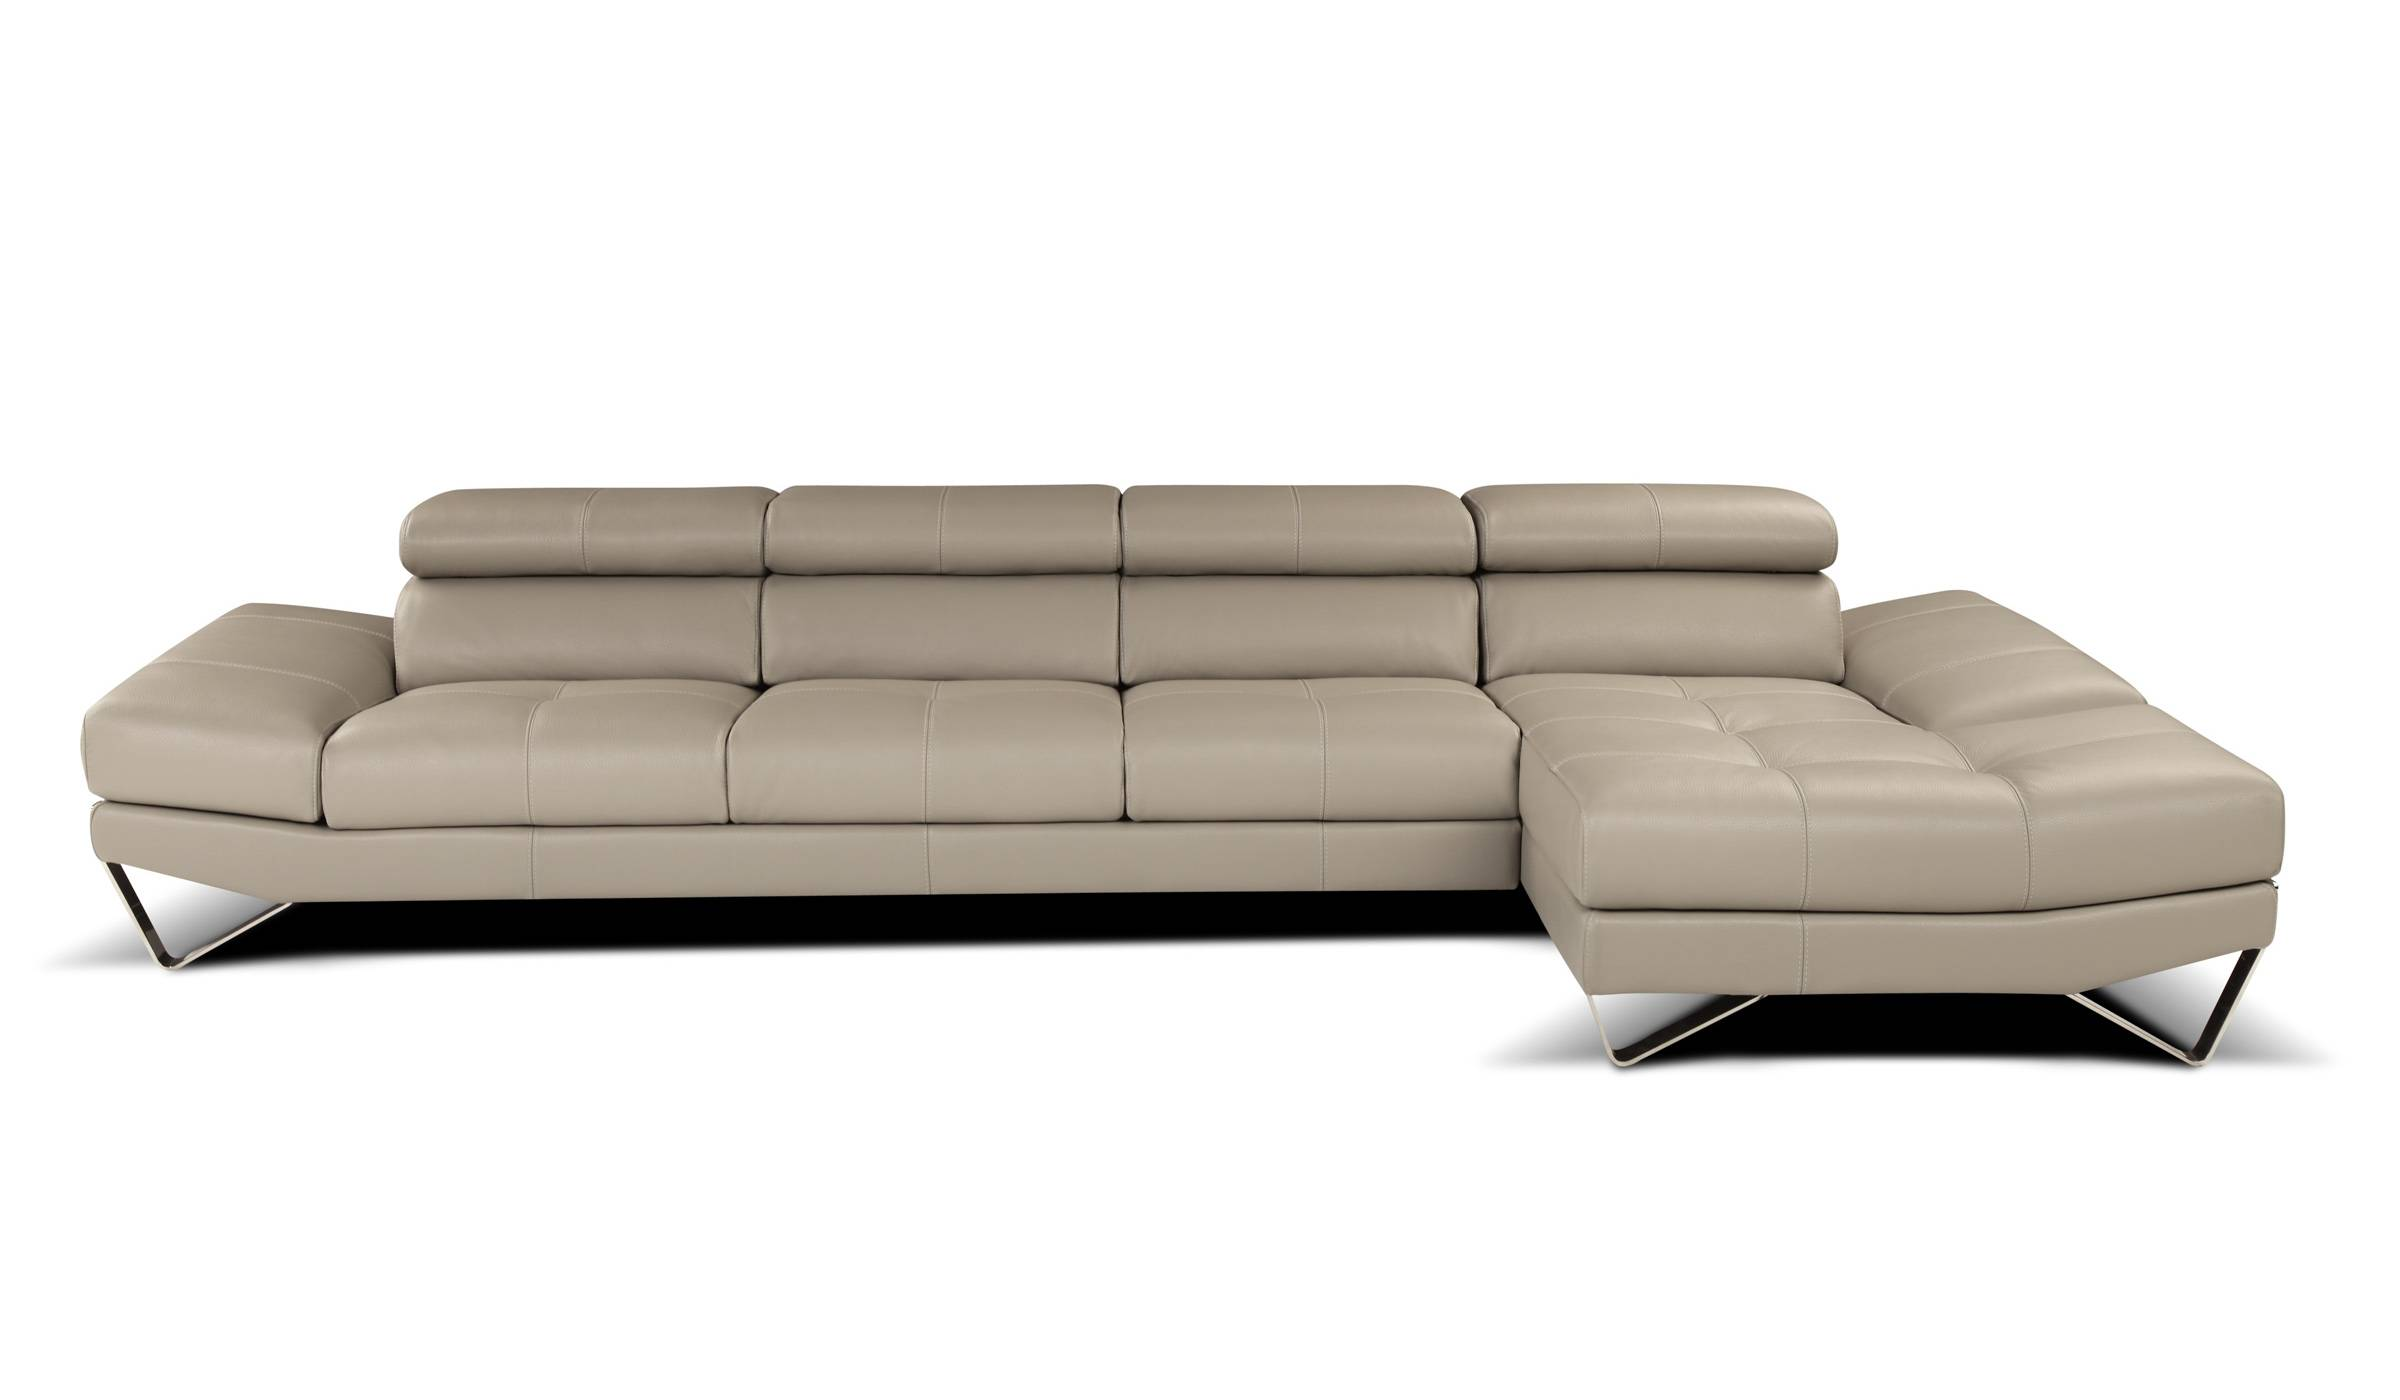 leather italia sofa furniture small black rattan corner sophisticated all italian sectional spokane